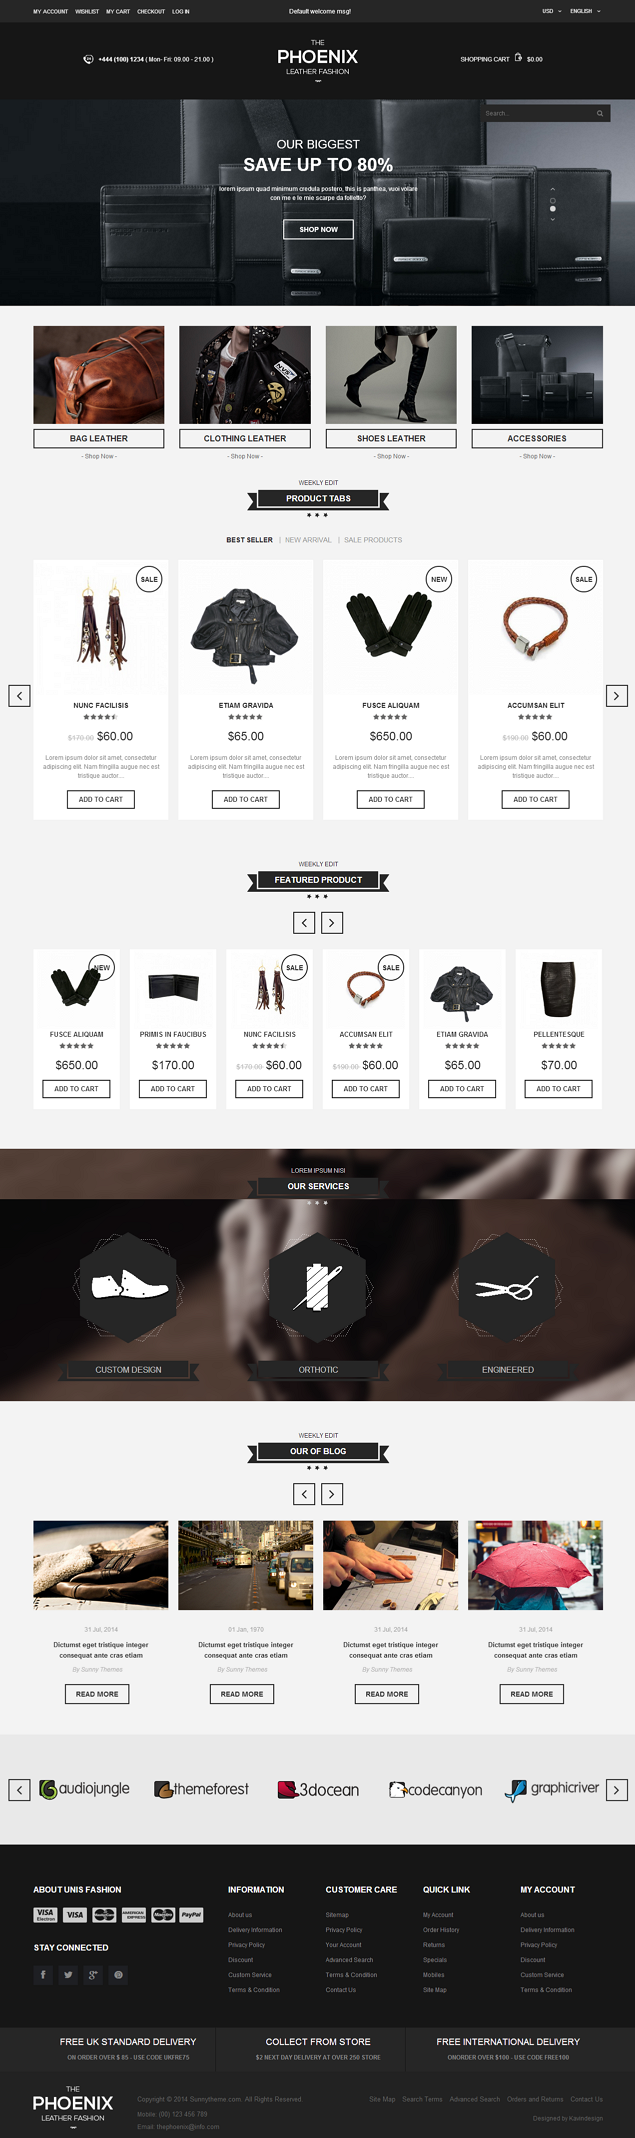 The Phoenix is a Premium Responsive Magento Theme. A super neat design, it has black&white s ...